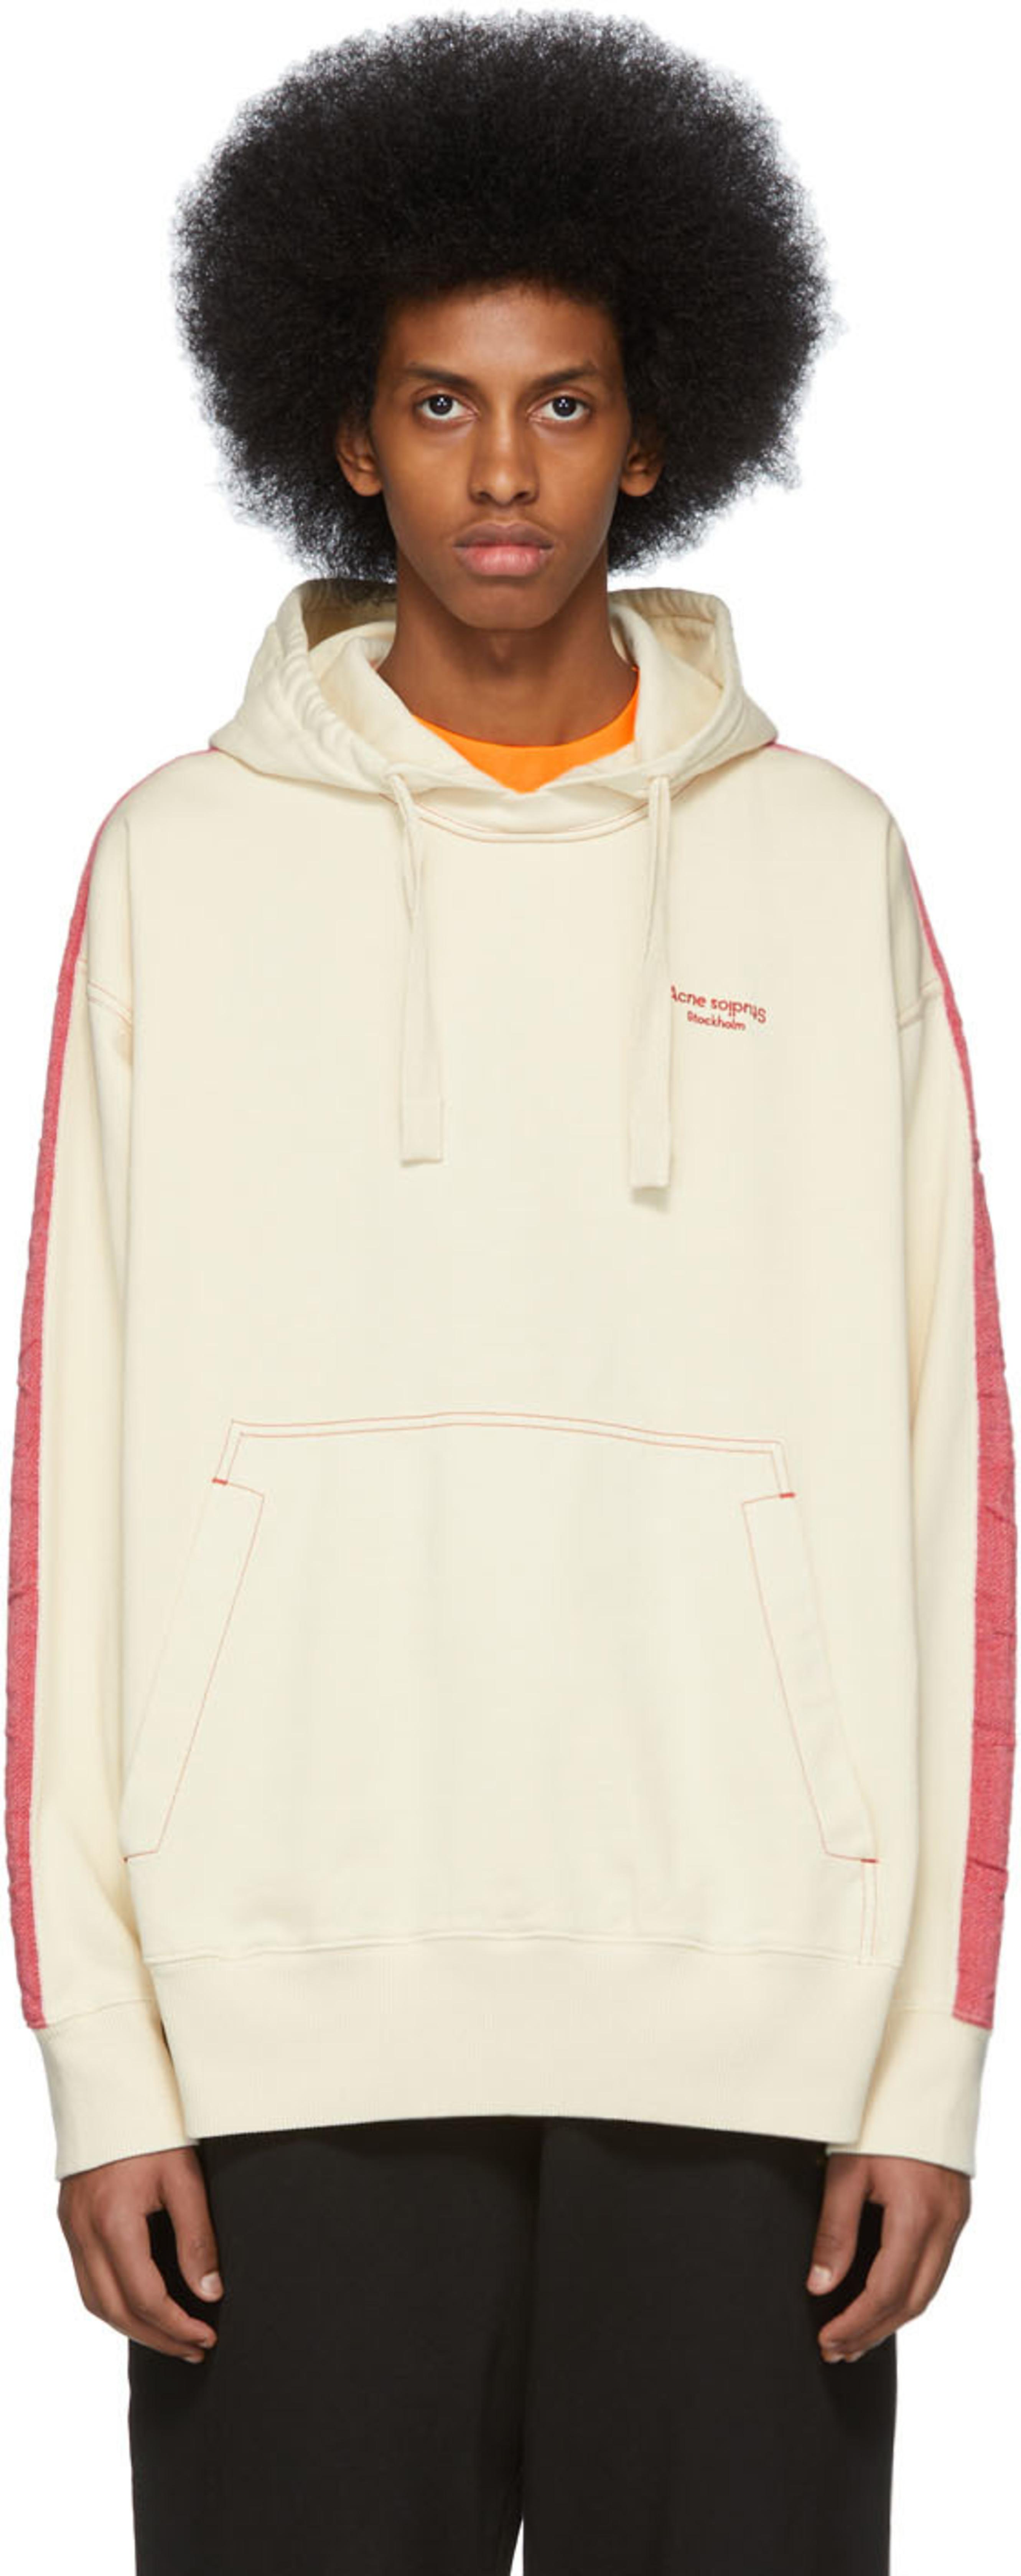 9e6d544ff1c Acne Studios sweaters for Men